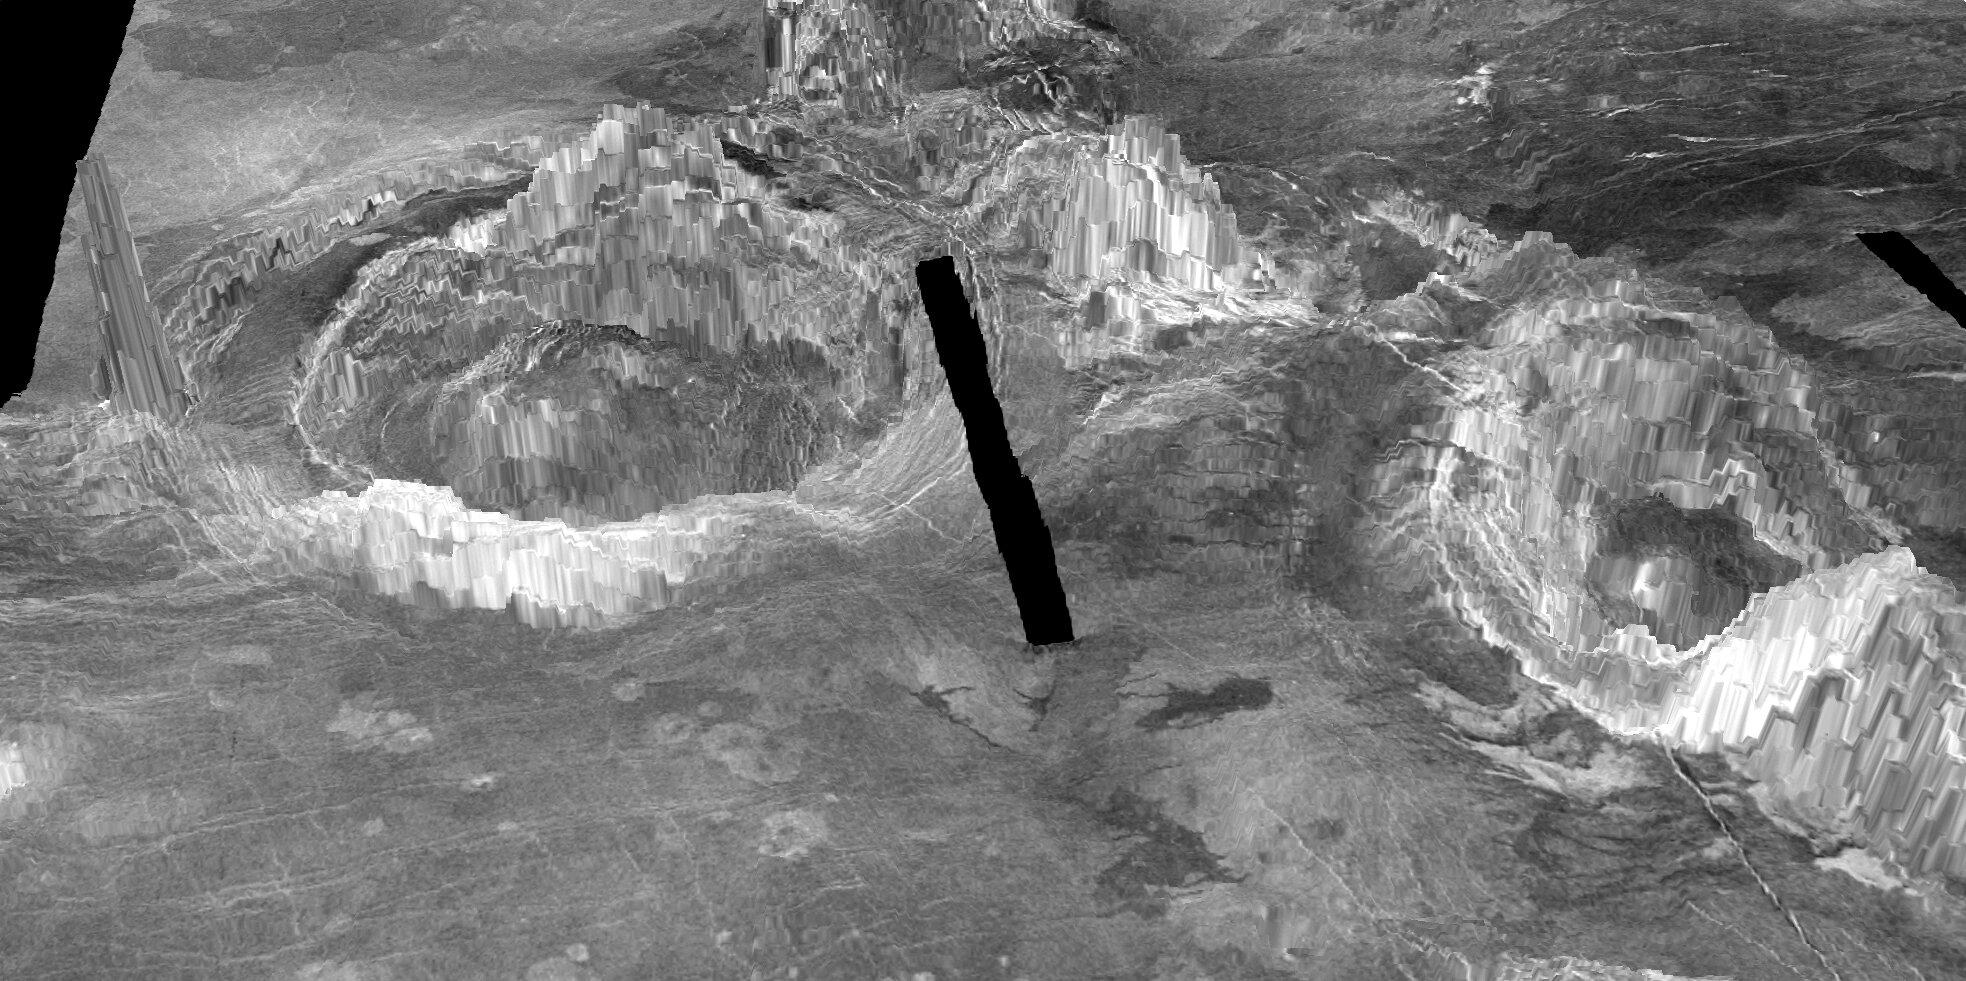 estrutura vulcânica ativa em Vênus